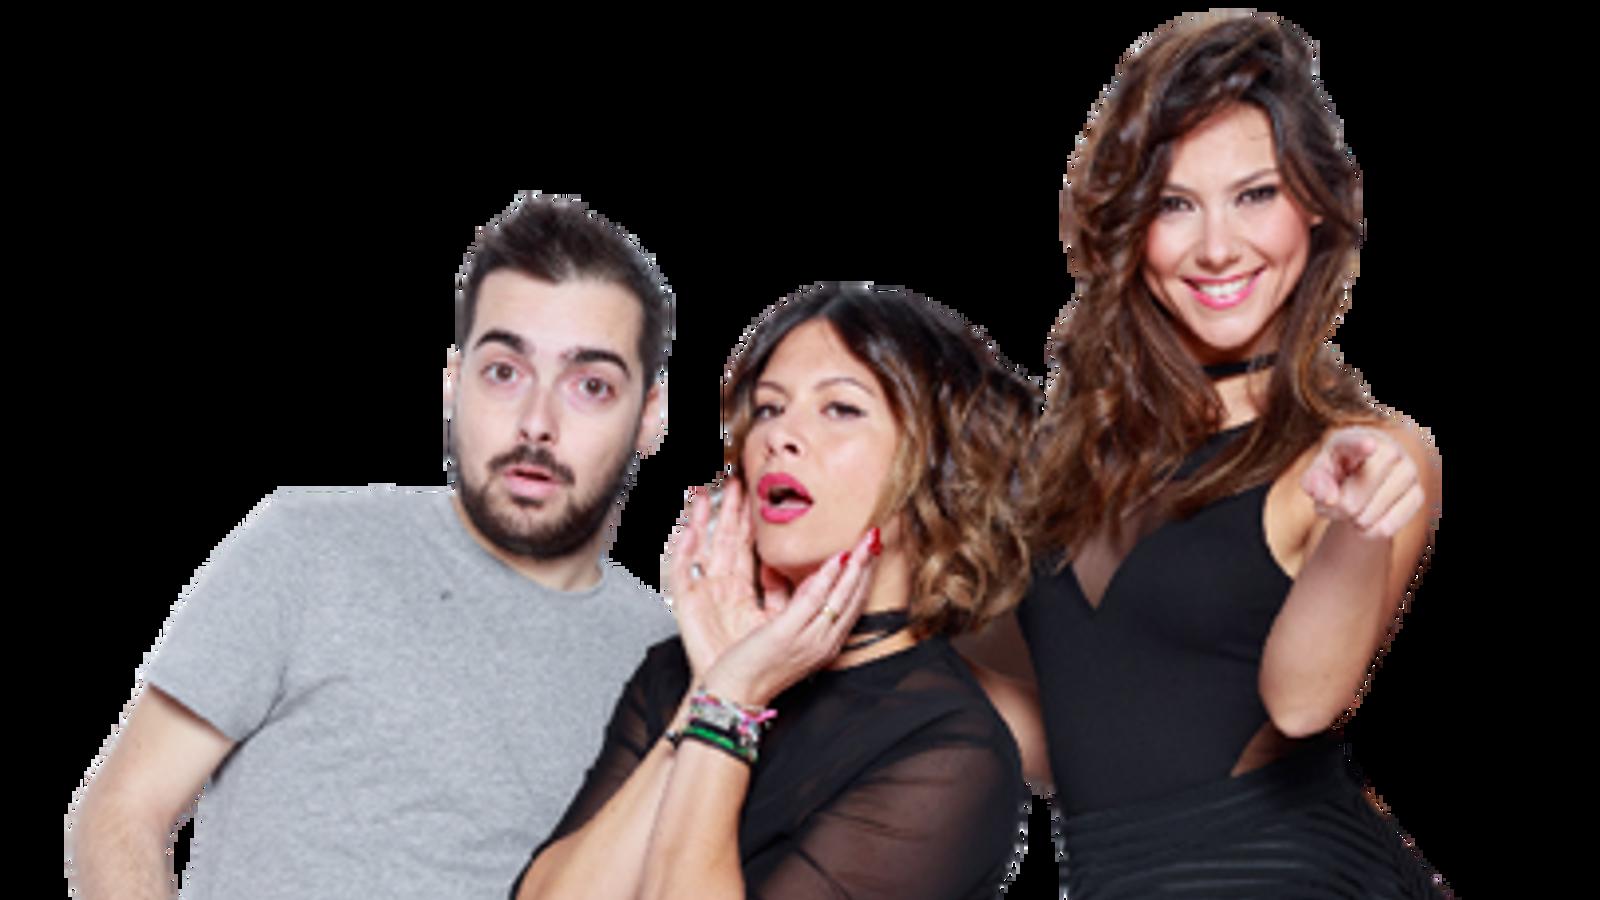 Pablo Guerola, Mar Montoro i Sara Gil presentaven 'Ponte a prueba'